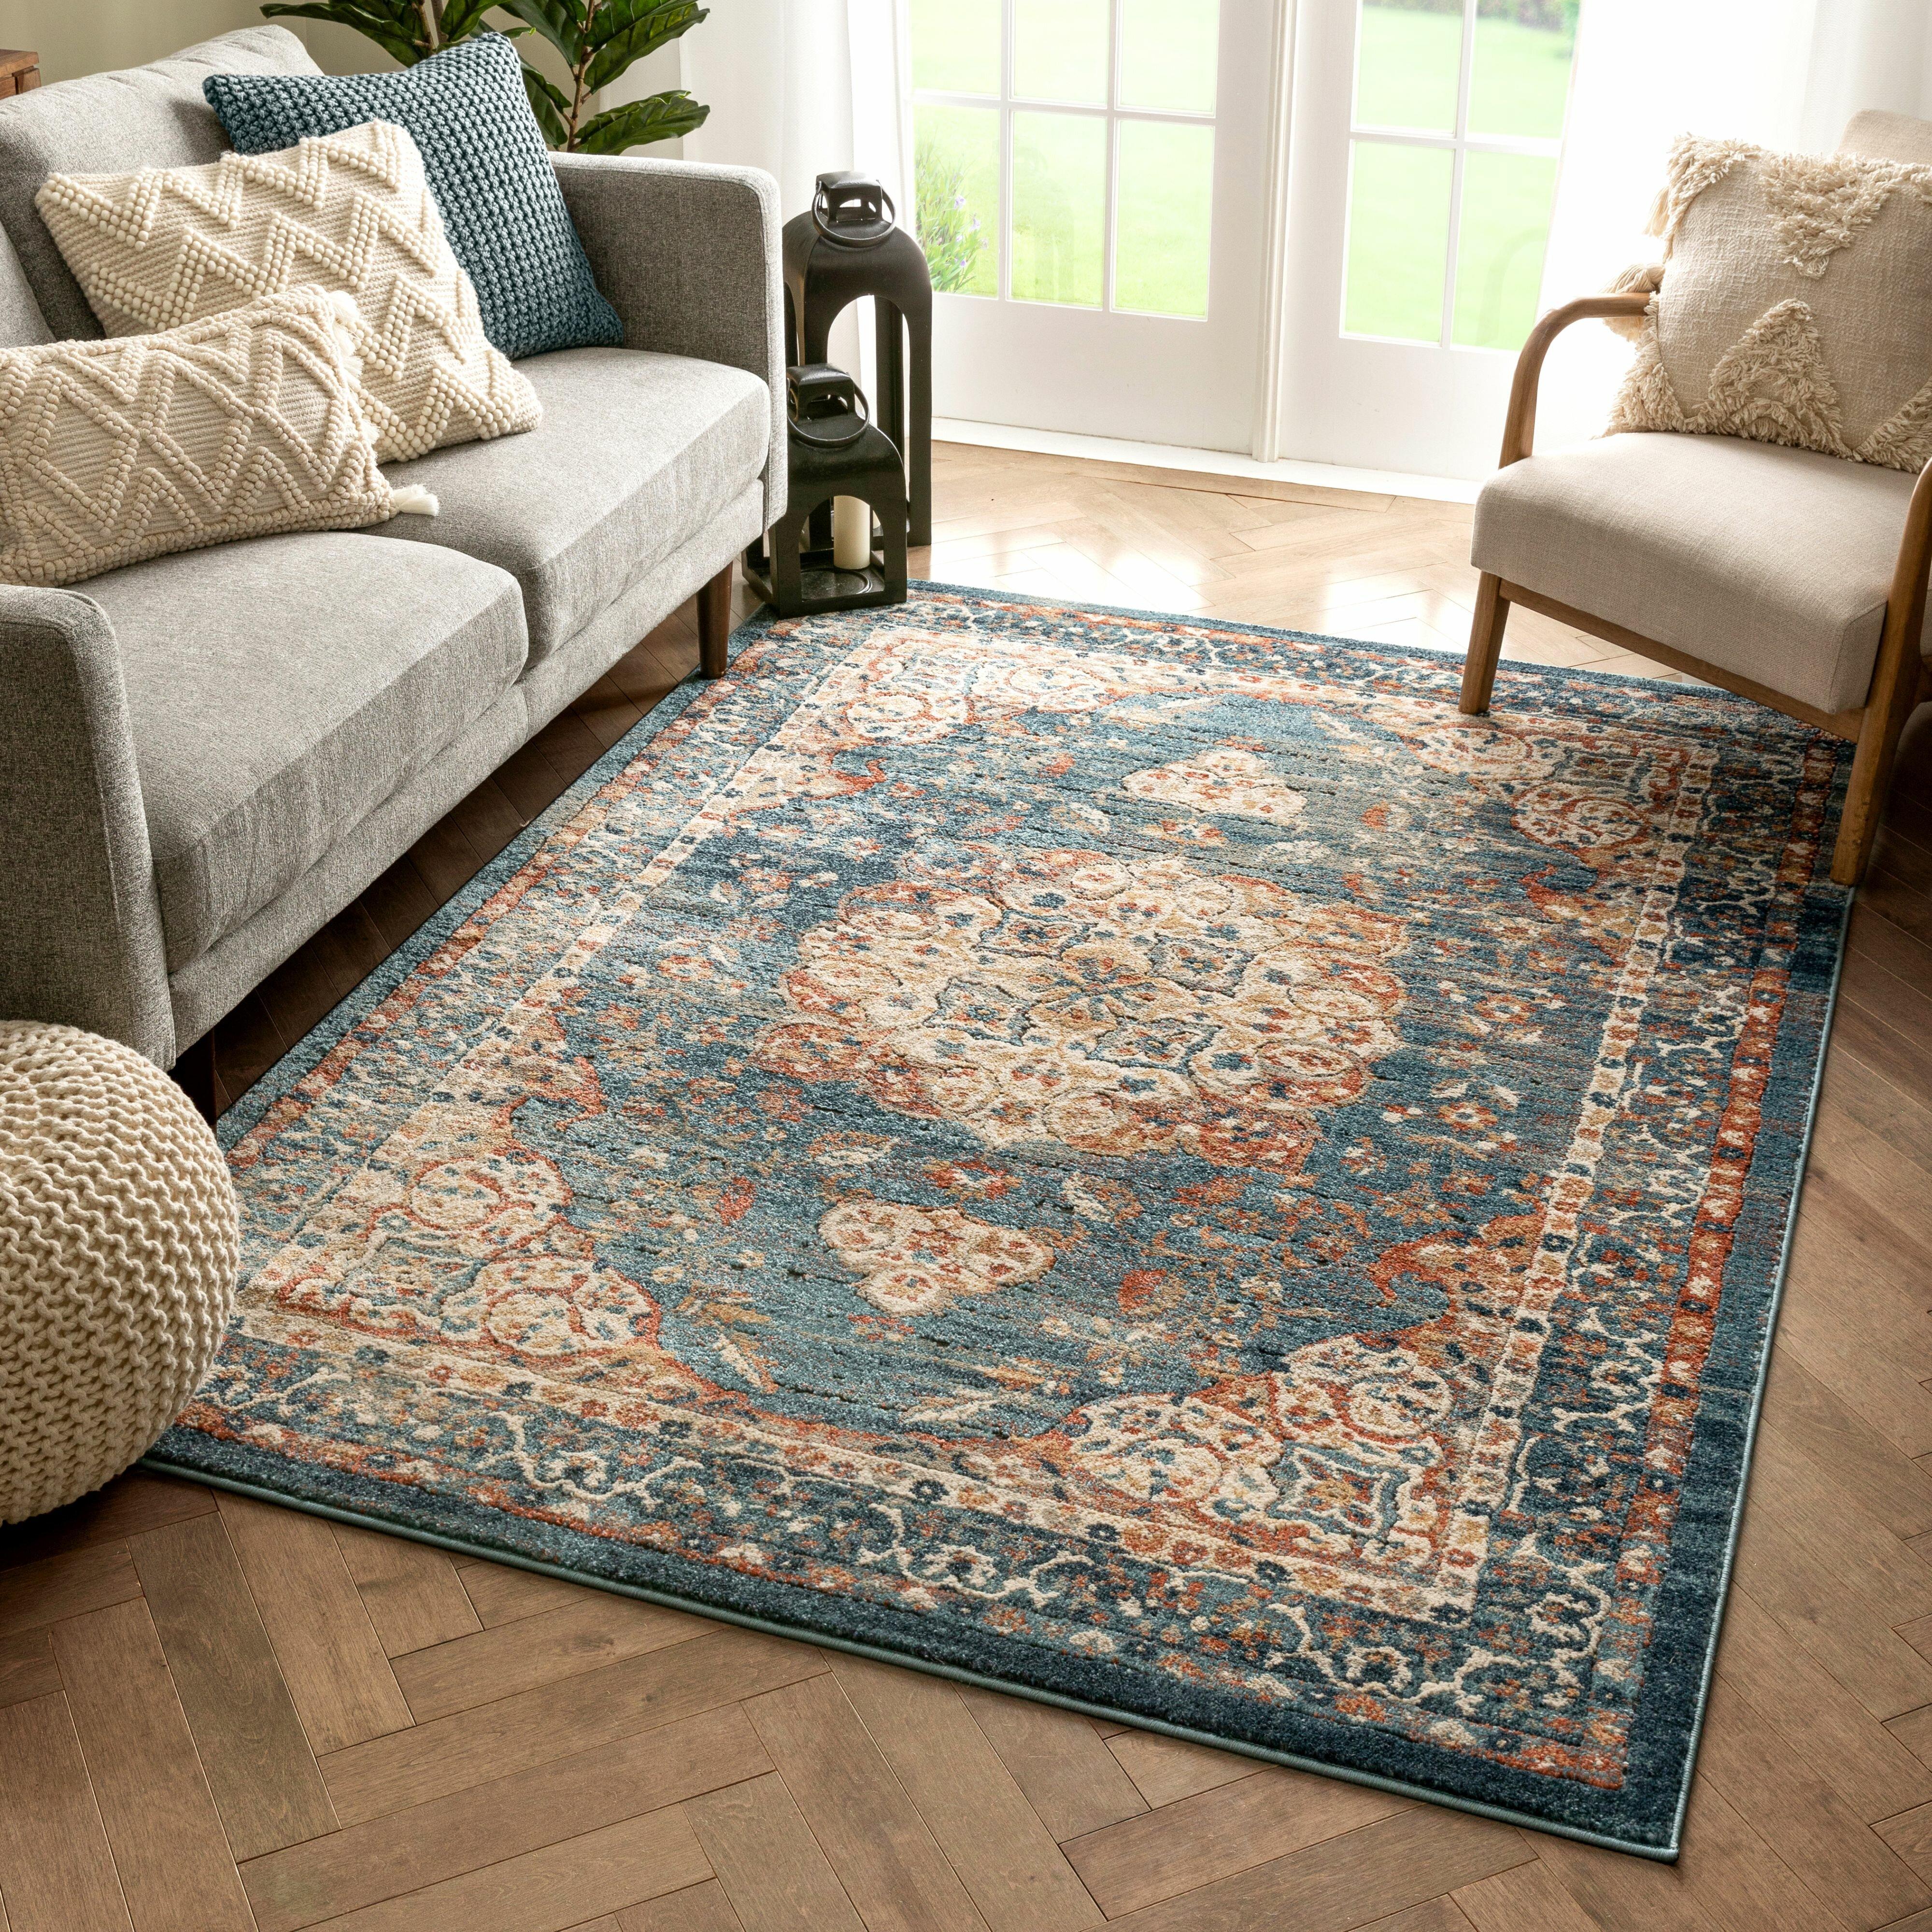 Blue Rug Traditional Vintage Medallion Area Rugs Living Room Dining Floor Carpet